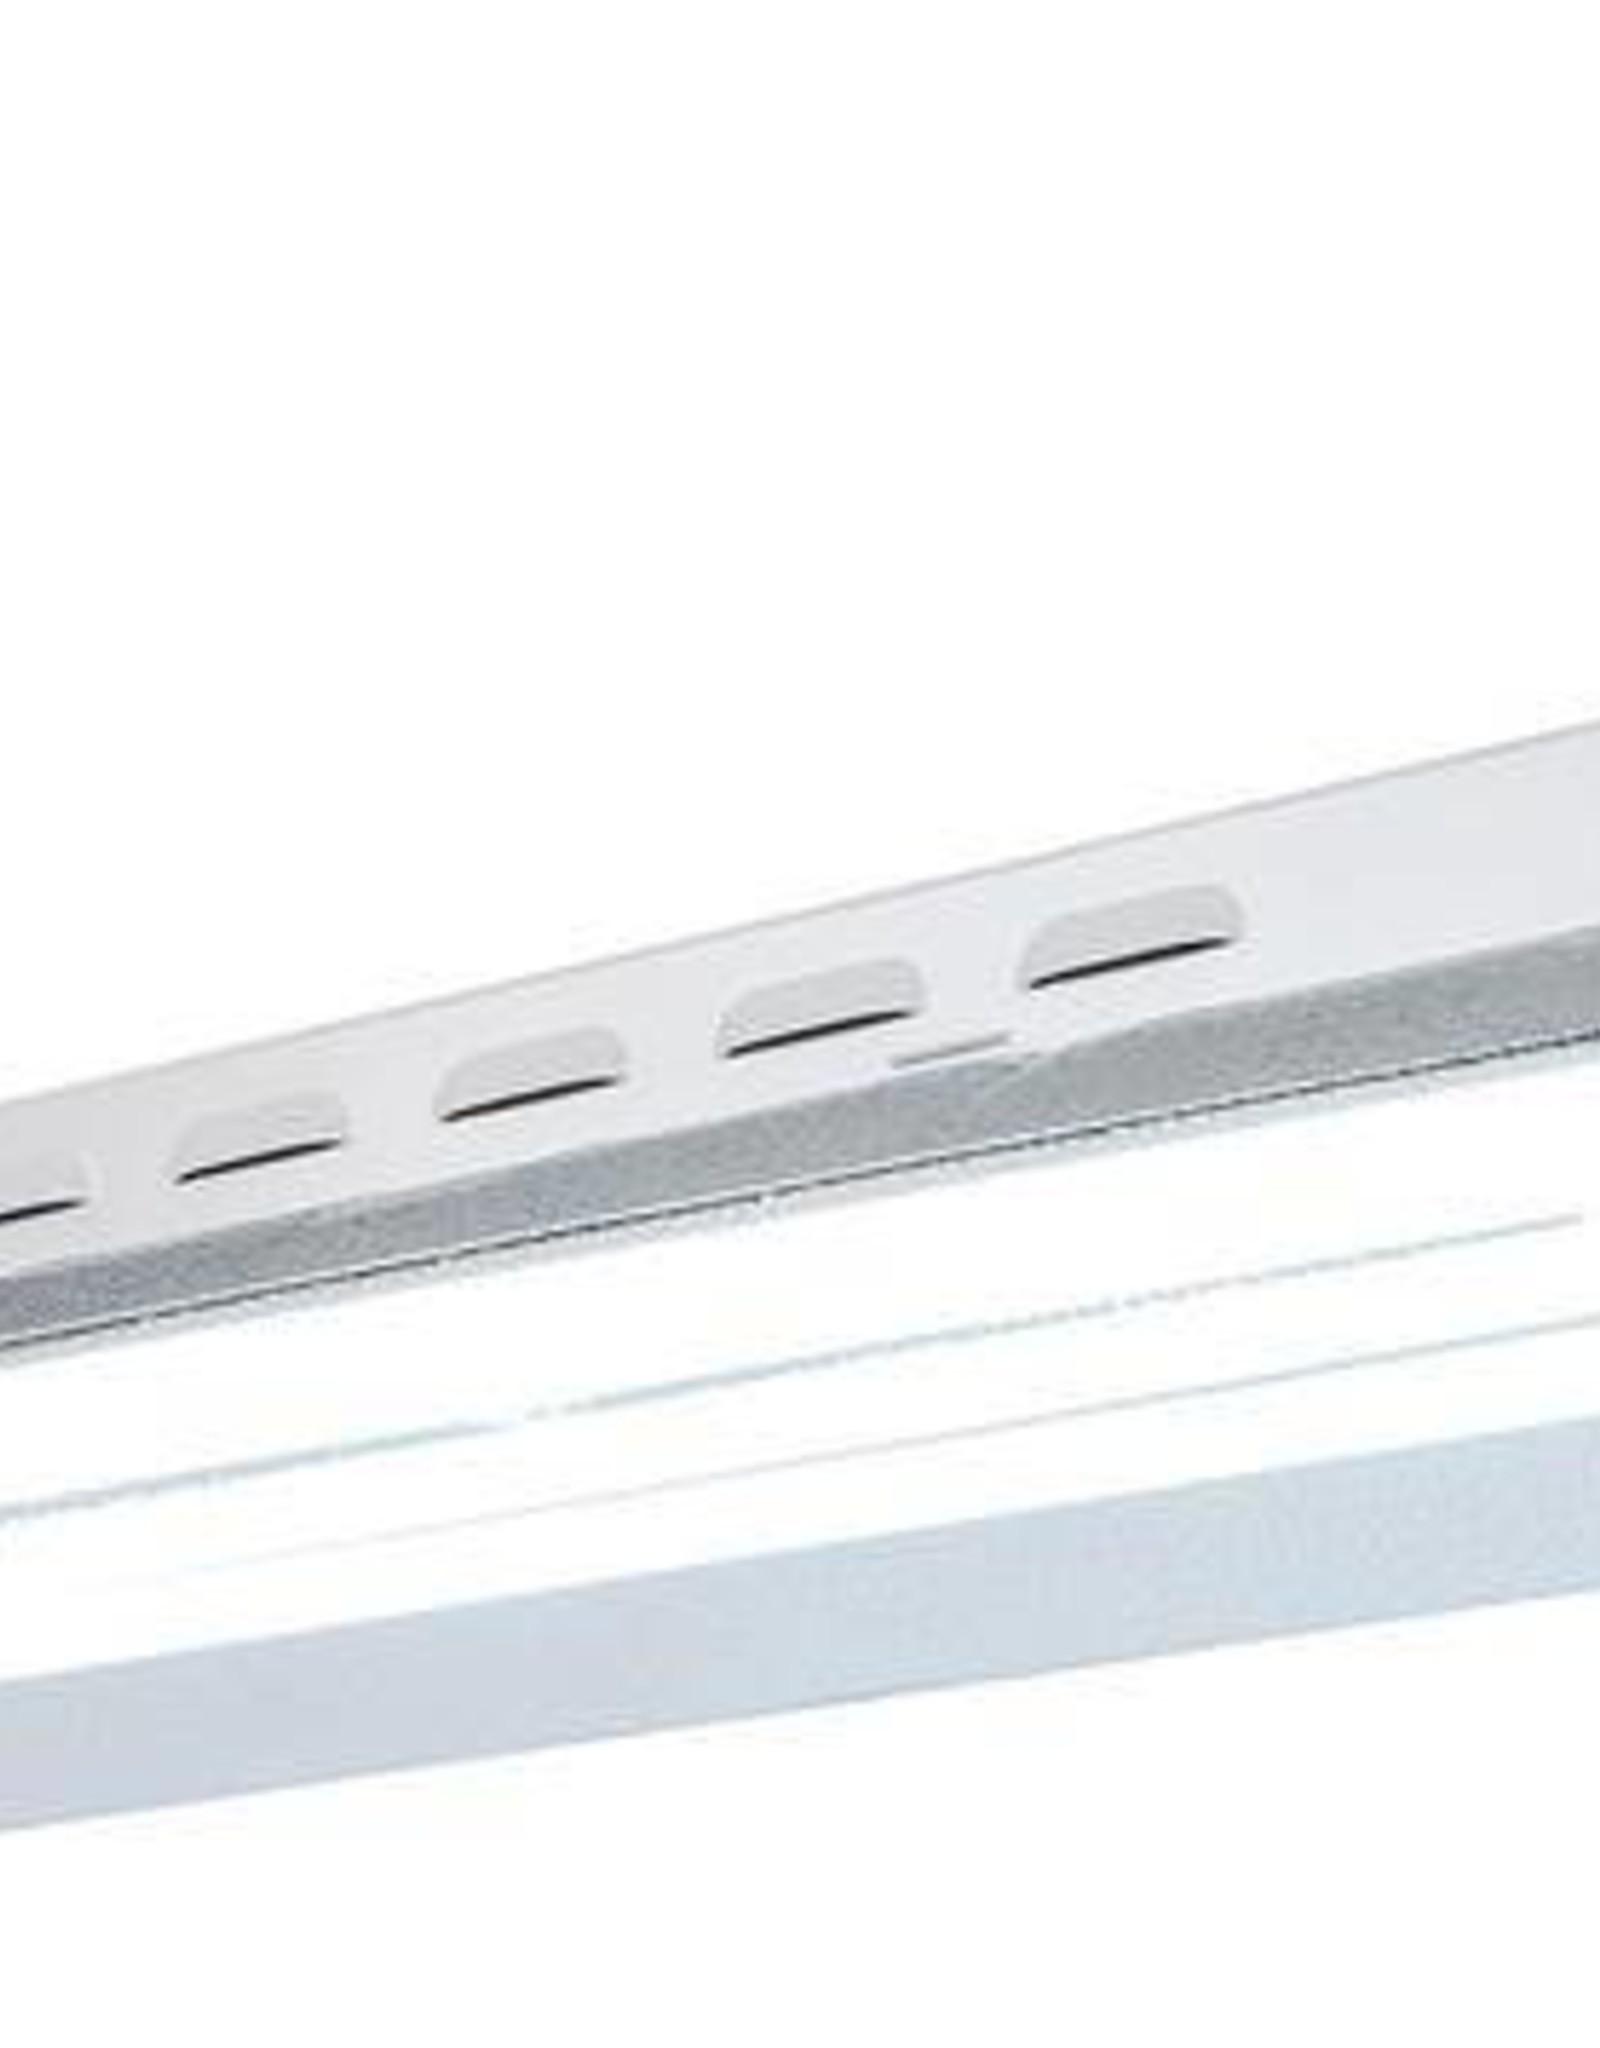 AgroFlex T5 HO 44 - 4 ft 4 Lamp T5 Fixture - 120 Volt